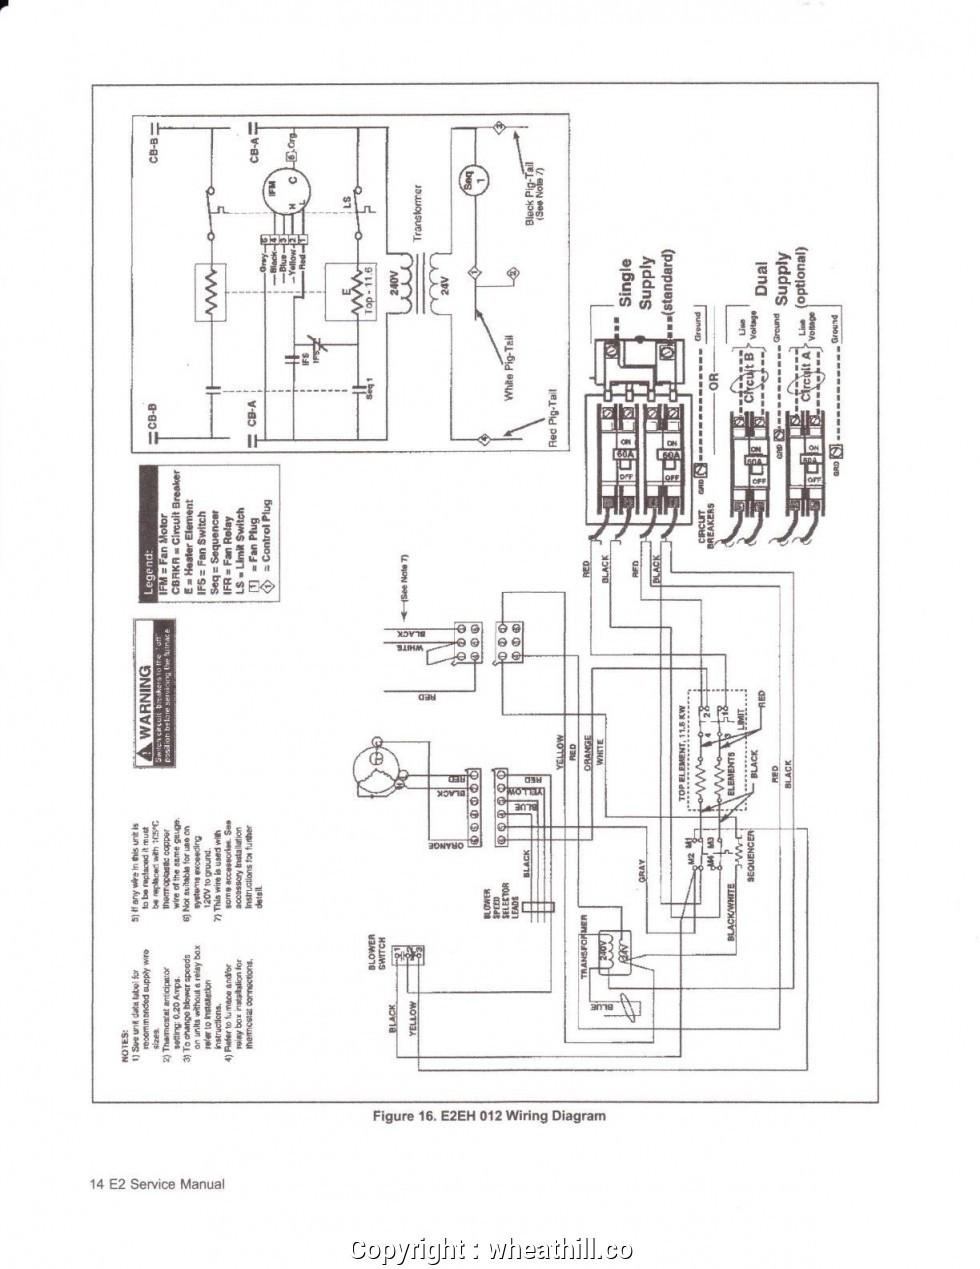 LY_0445] 6 Point Plug Wiring DiagramMonoc Exmet Mohammedshrine Librar Wiring 101